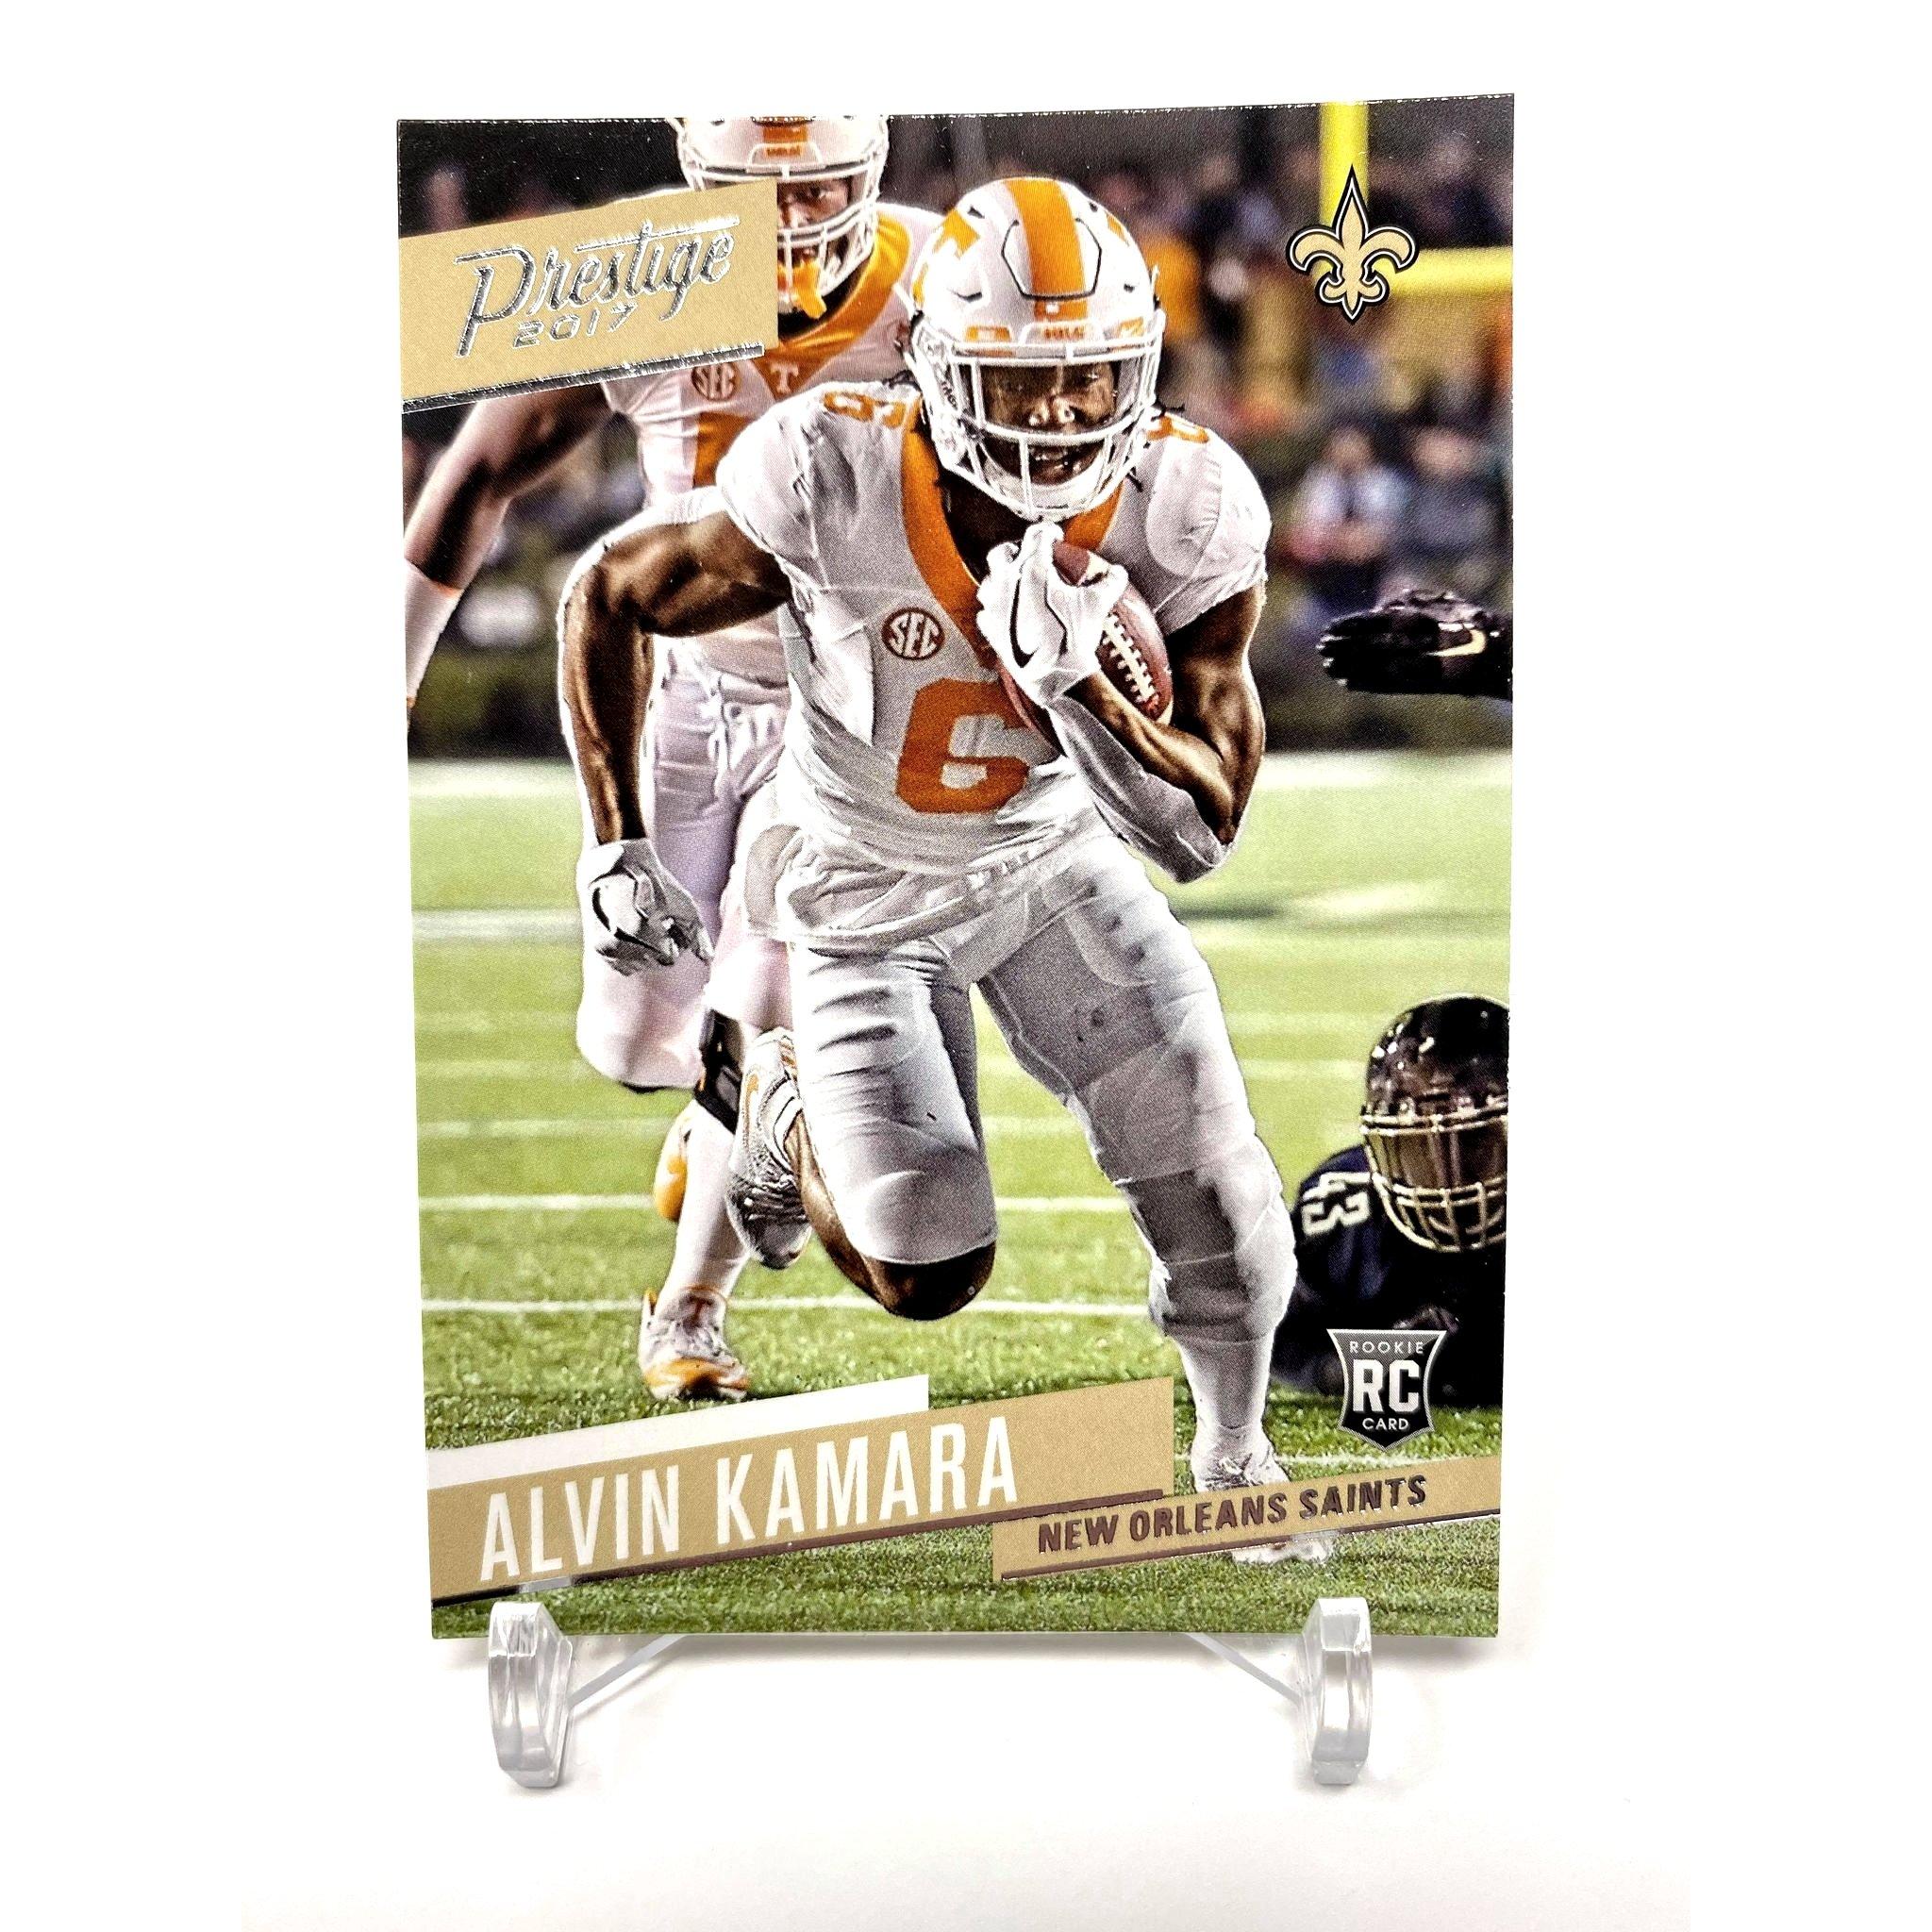 2017 Panini Prestige Alvin Kamara Rookie Card New Orleans Saints